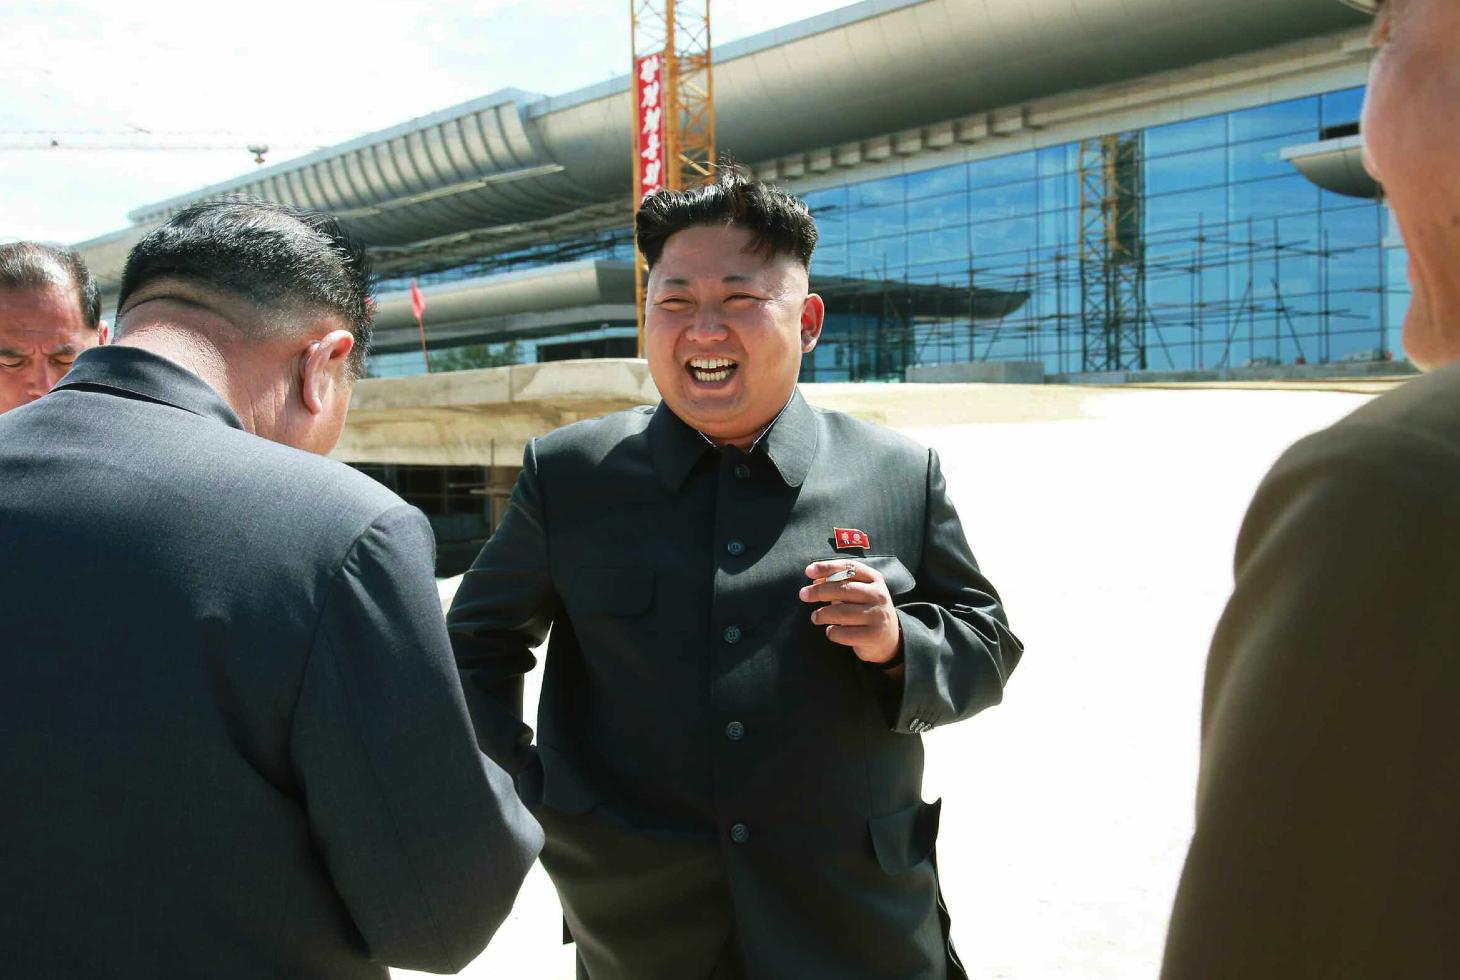 Kim Jong Un smokes a cigarette during his visit to the construction of a terminal at Pyongyang Airport (Photo: Rodong Sinmun).